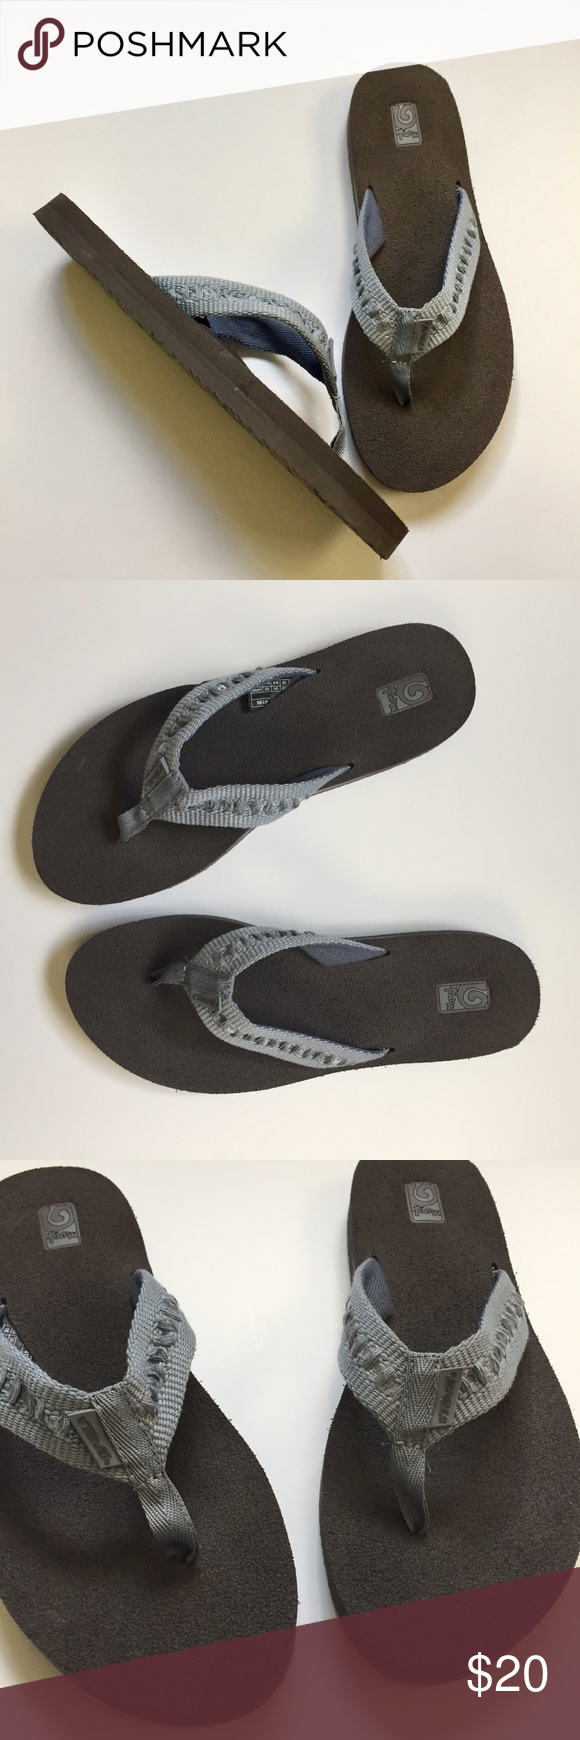 1377a228ba1e33 NEW TEVA Original Mush Flip Slop Sandal Comfort New without tags. Yoga mat  like comfort